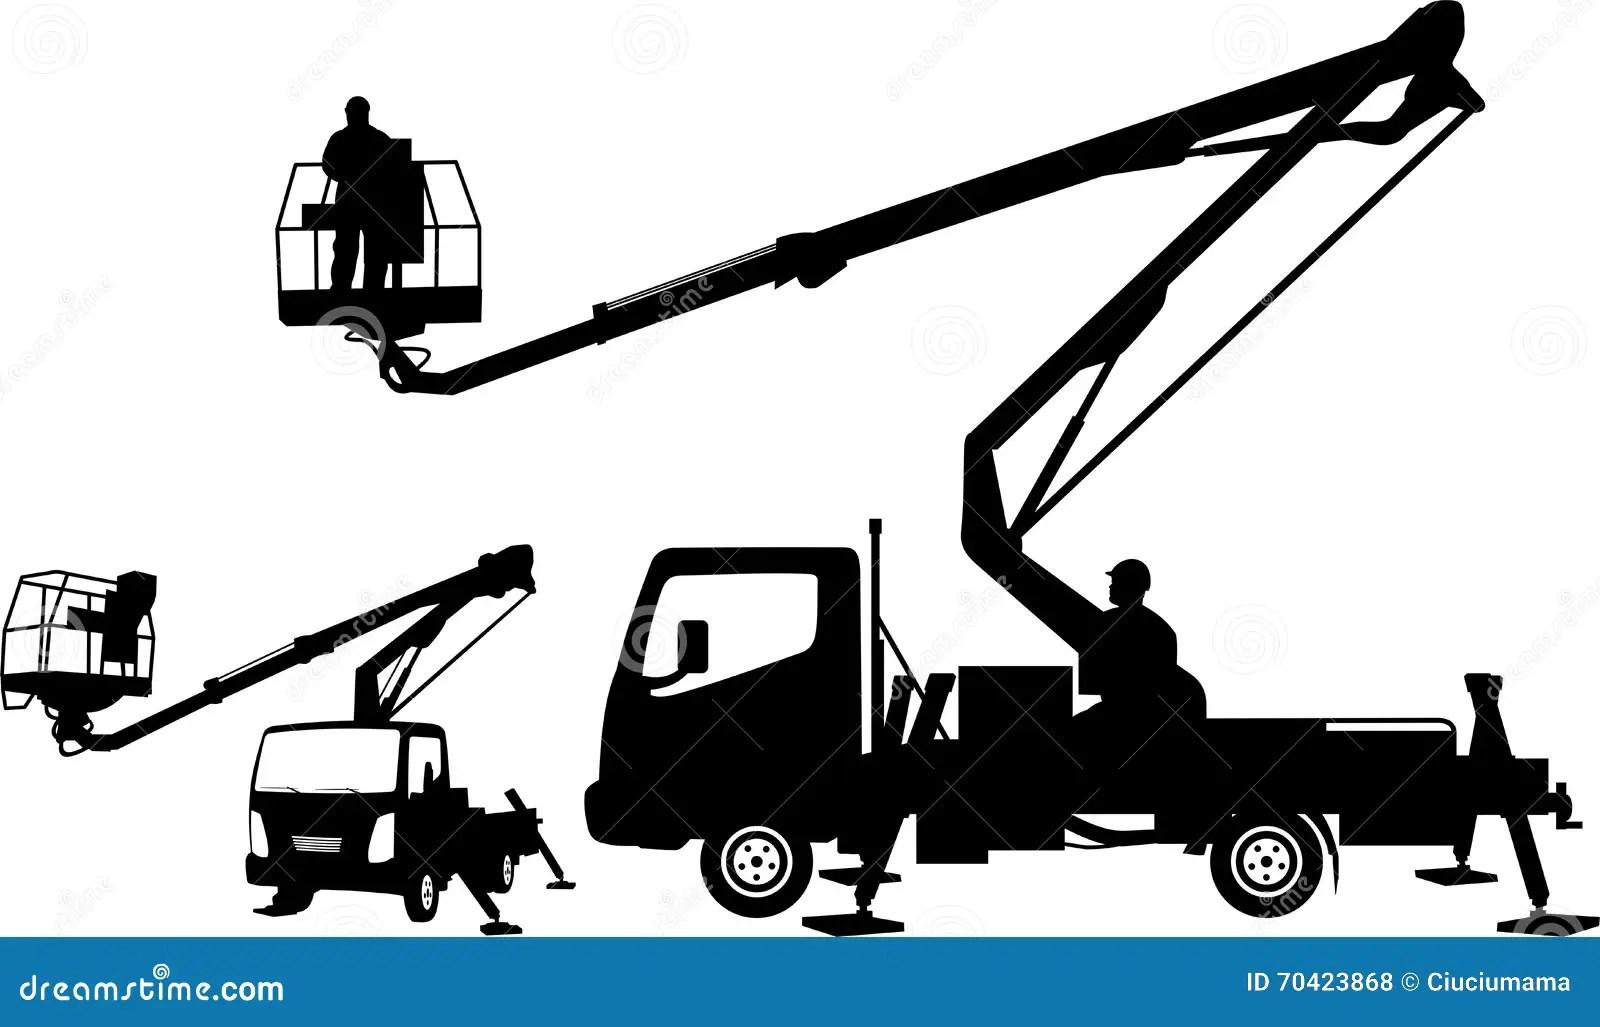 Bucket Truck Silhouettes Stock Vector Illustration Of